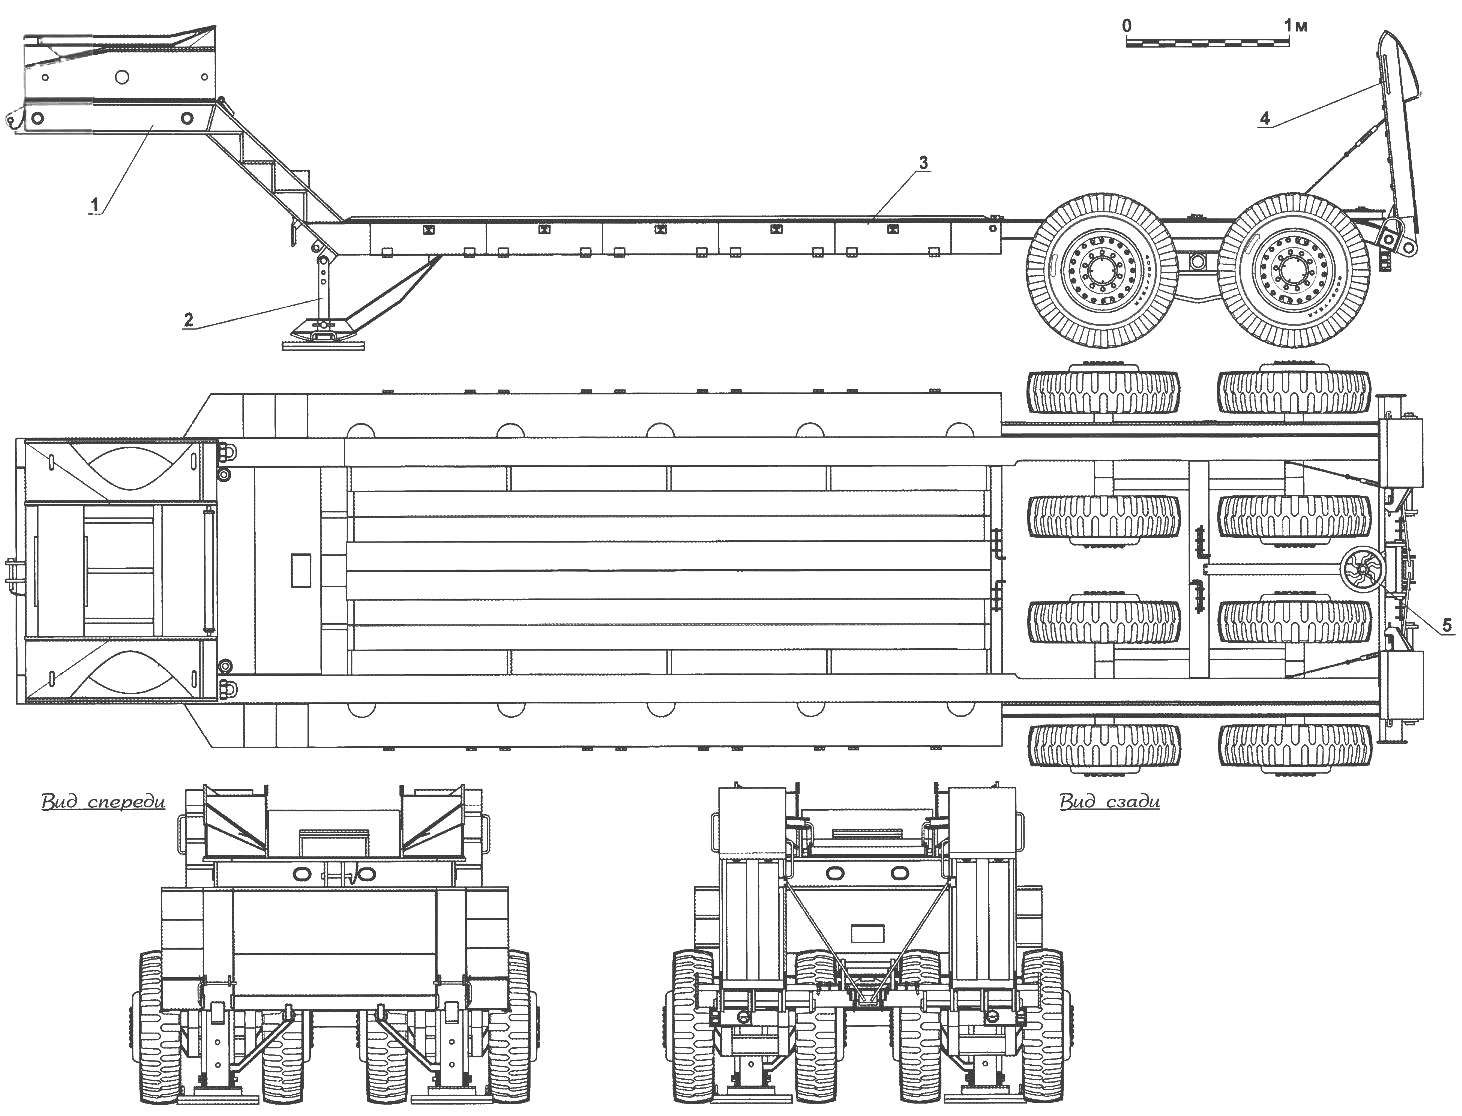 Semi-trailer-Transporter M15